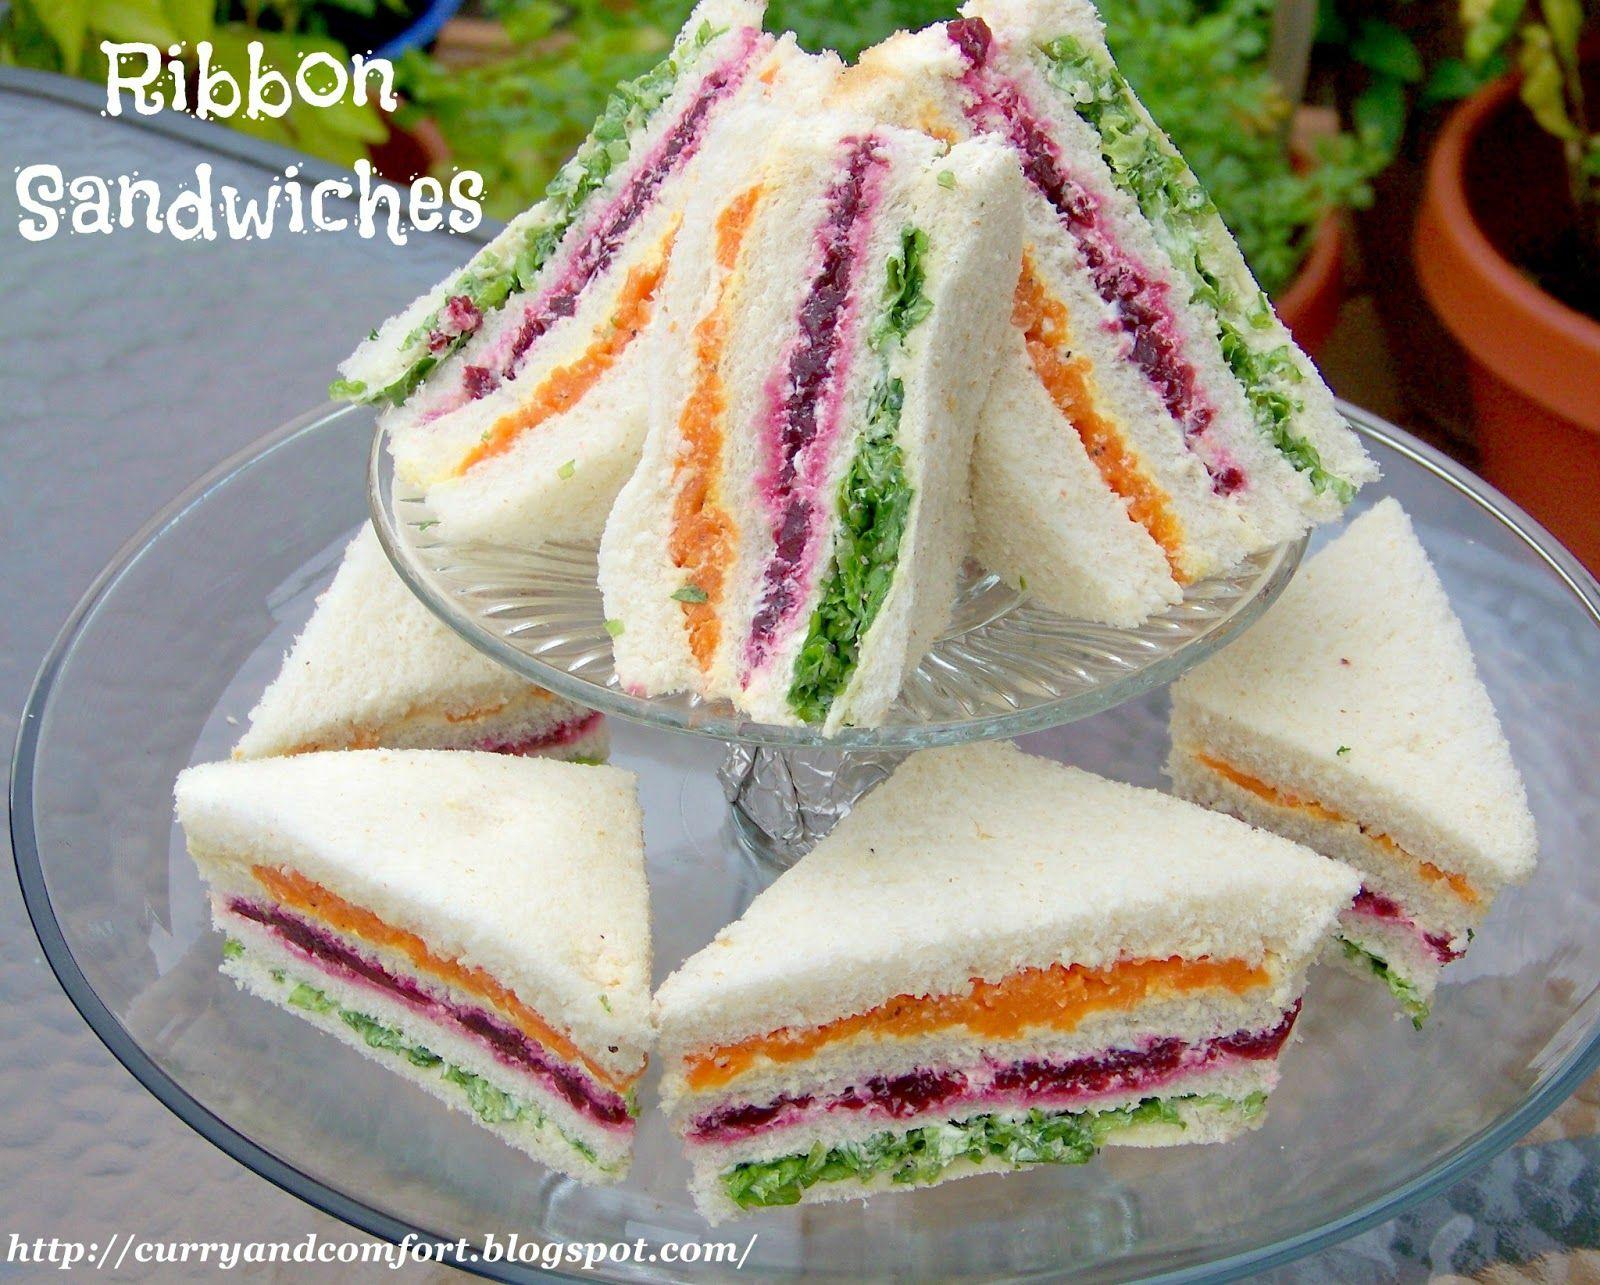 Kitchen simmer sri lankan ribbon sandwiches vegetable for Club sandwich fillings for high tea